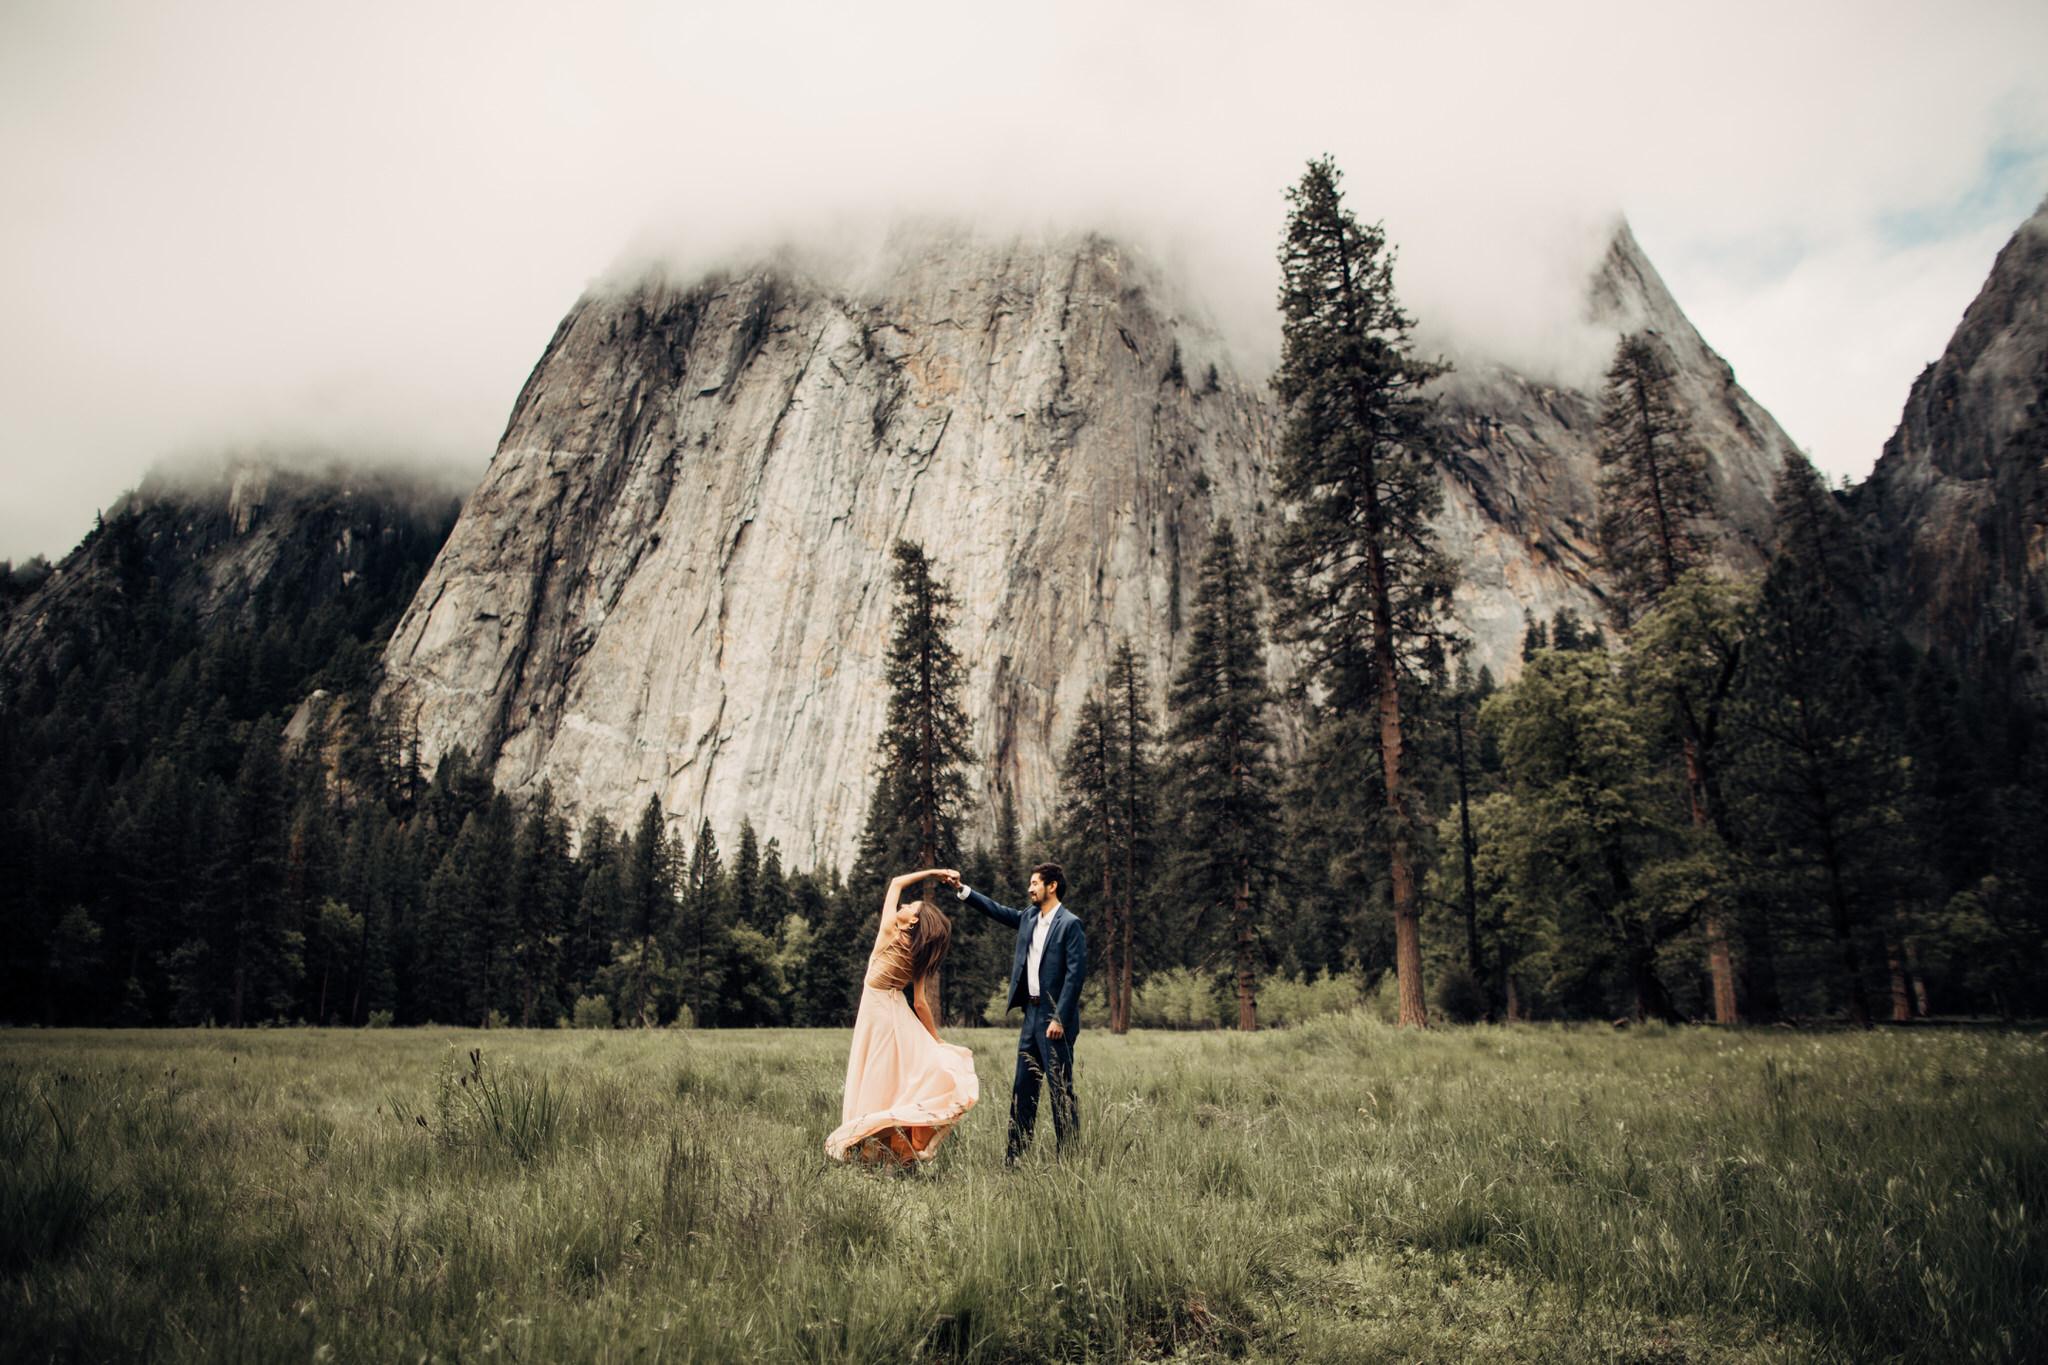 Yosemite-engagement-session-lauren-and-tom61.jpg